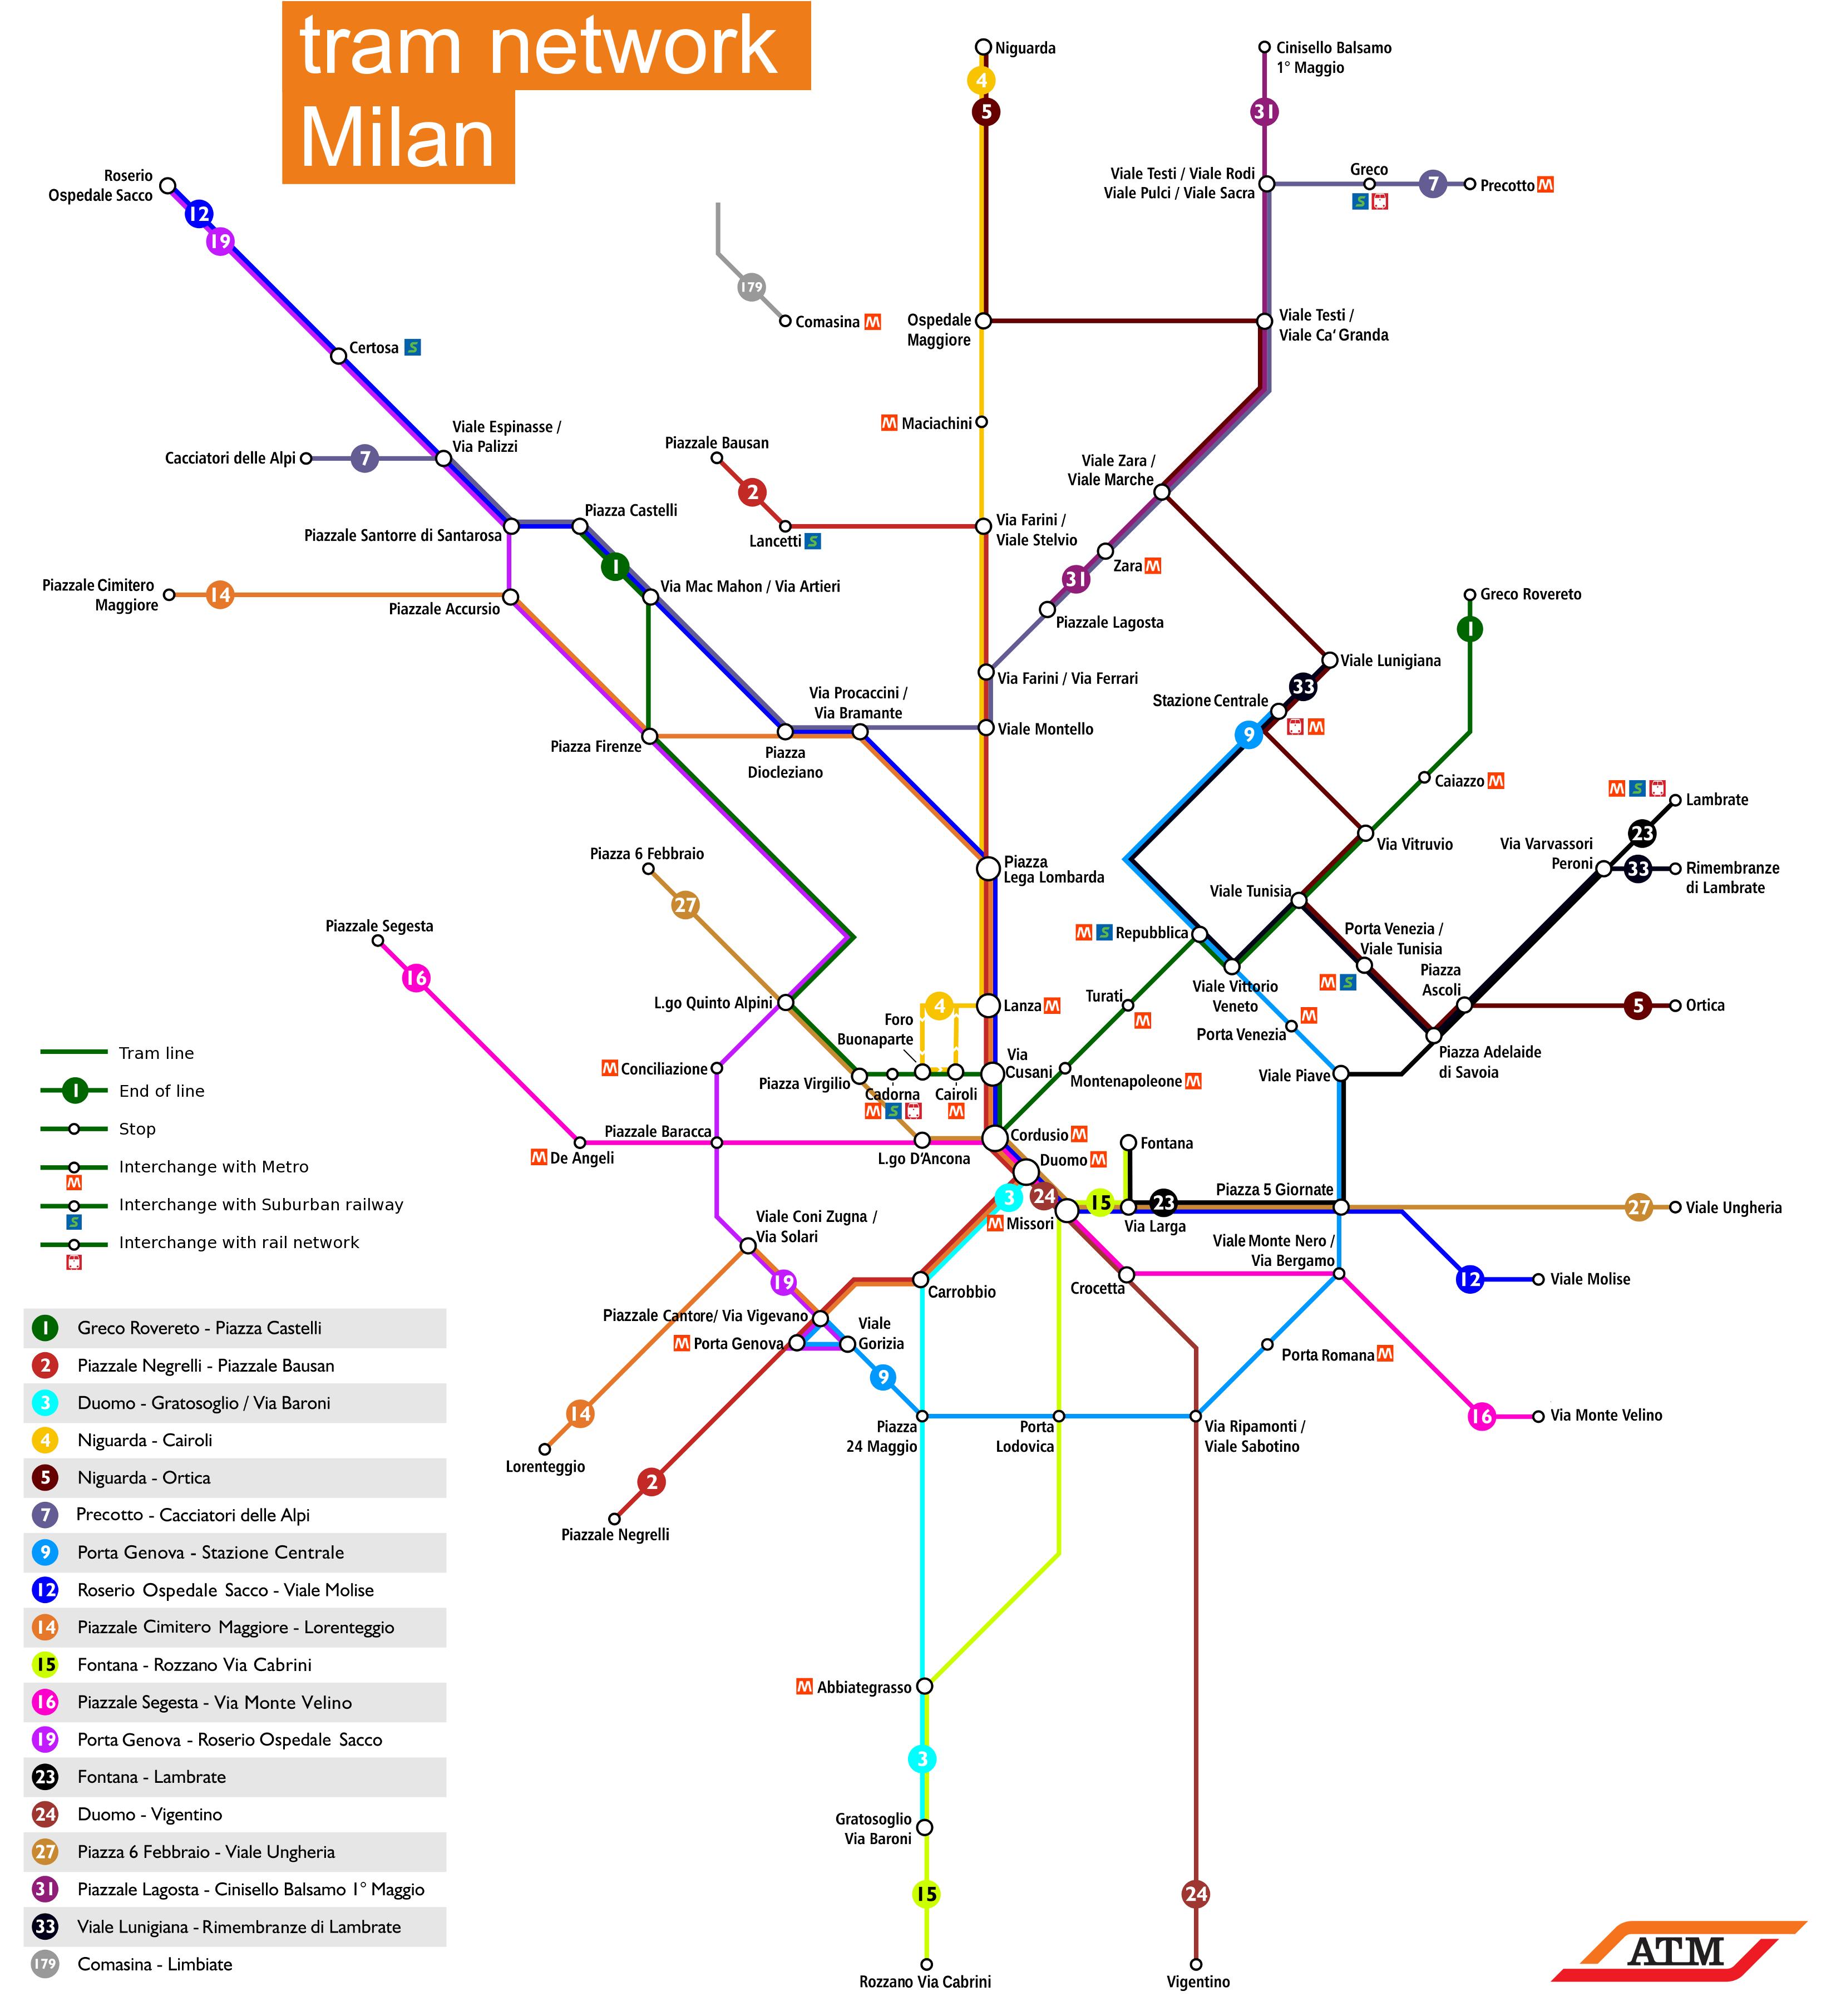 FileTram network Milanpng Wikimedia Commons